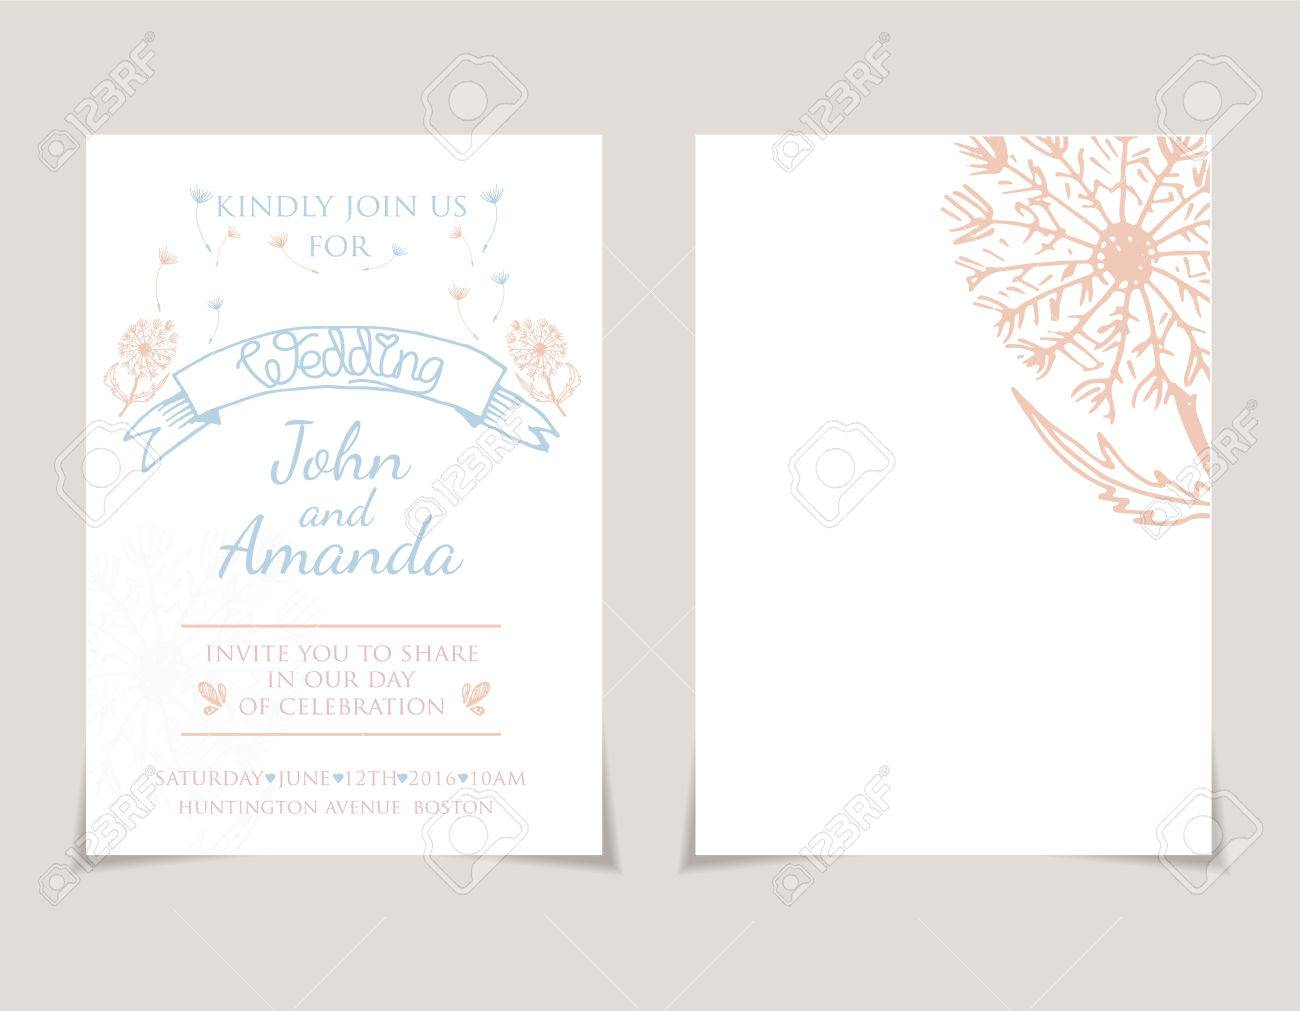 Wedding Invitation Card Templates With Hand Drawn Dandelion Vector